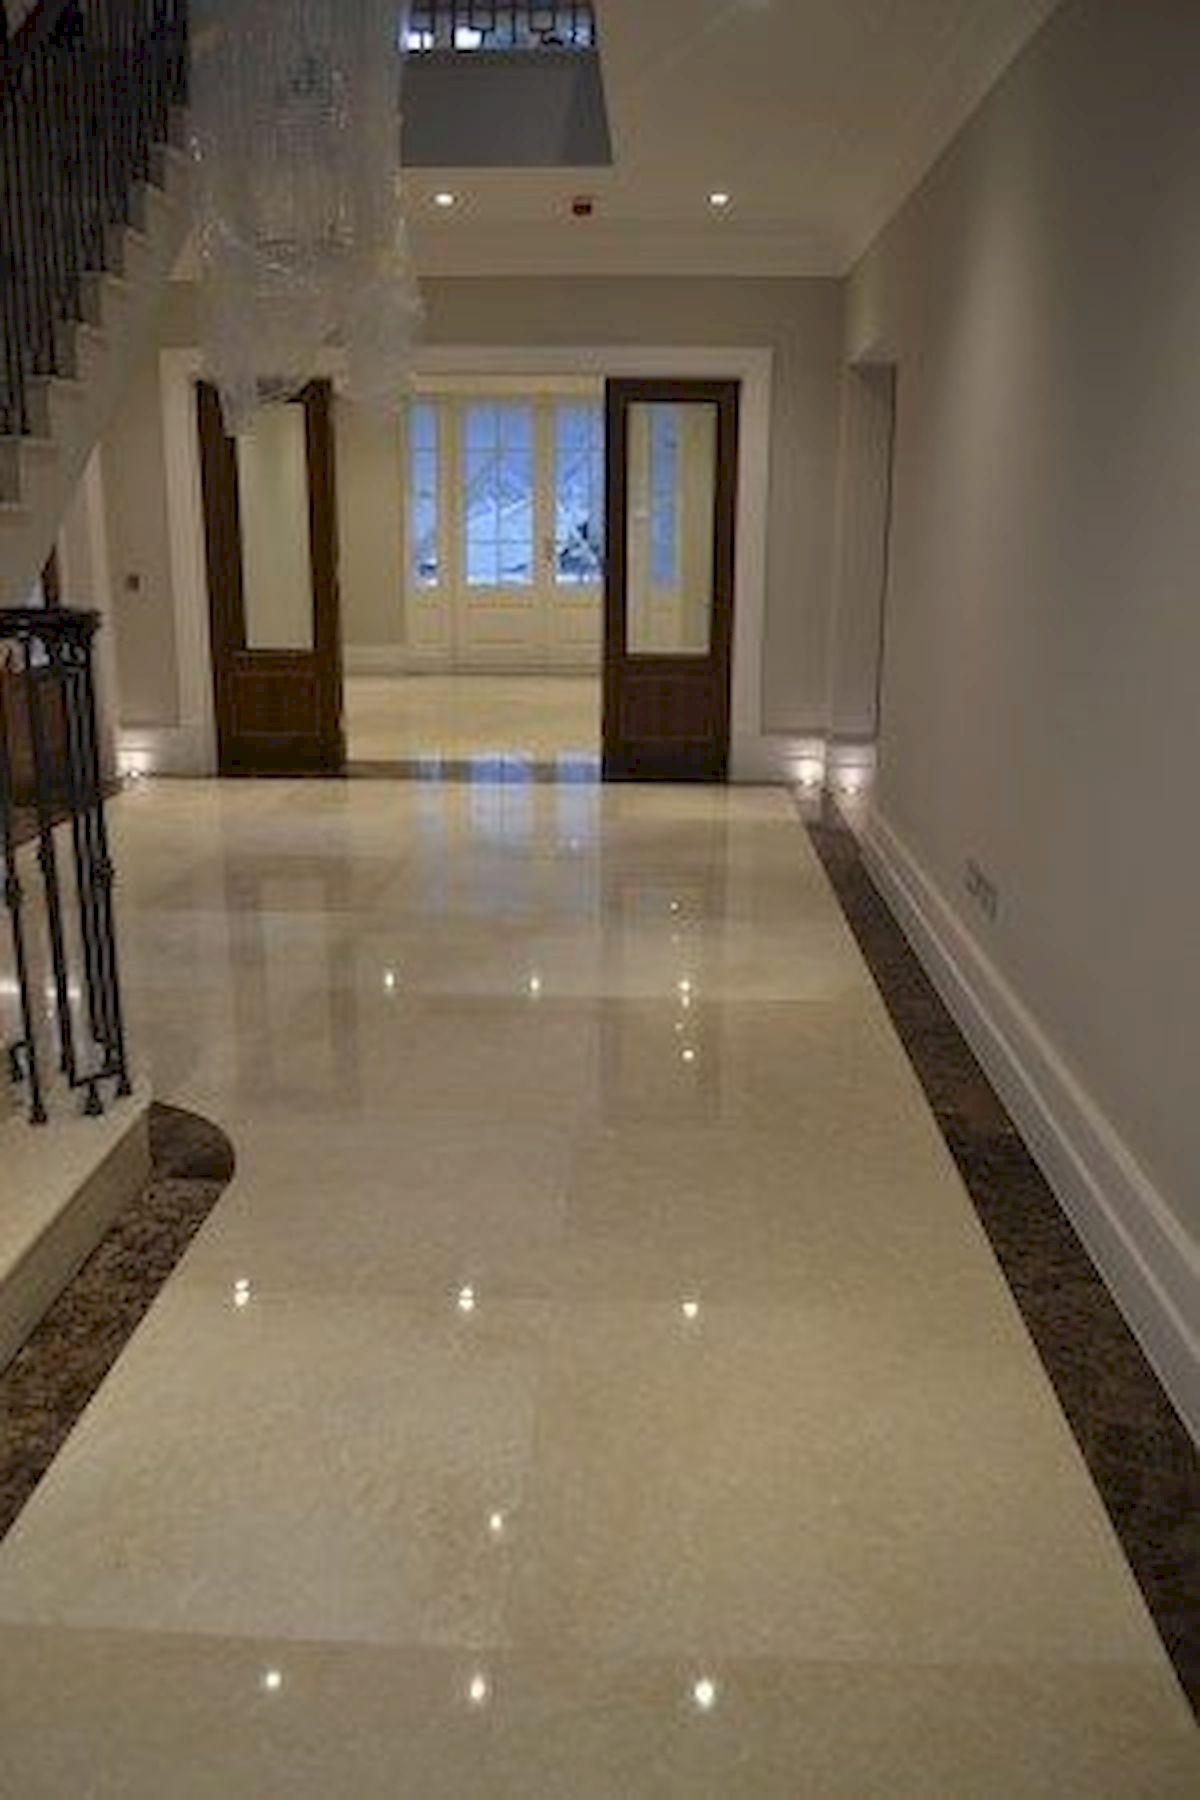 70 Smooth Concrete Floor Ideas for Interior Home 55 ...